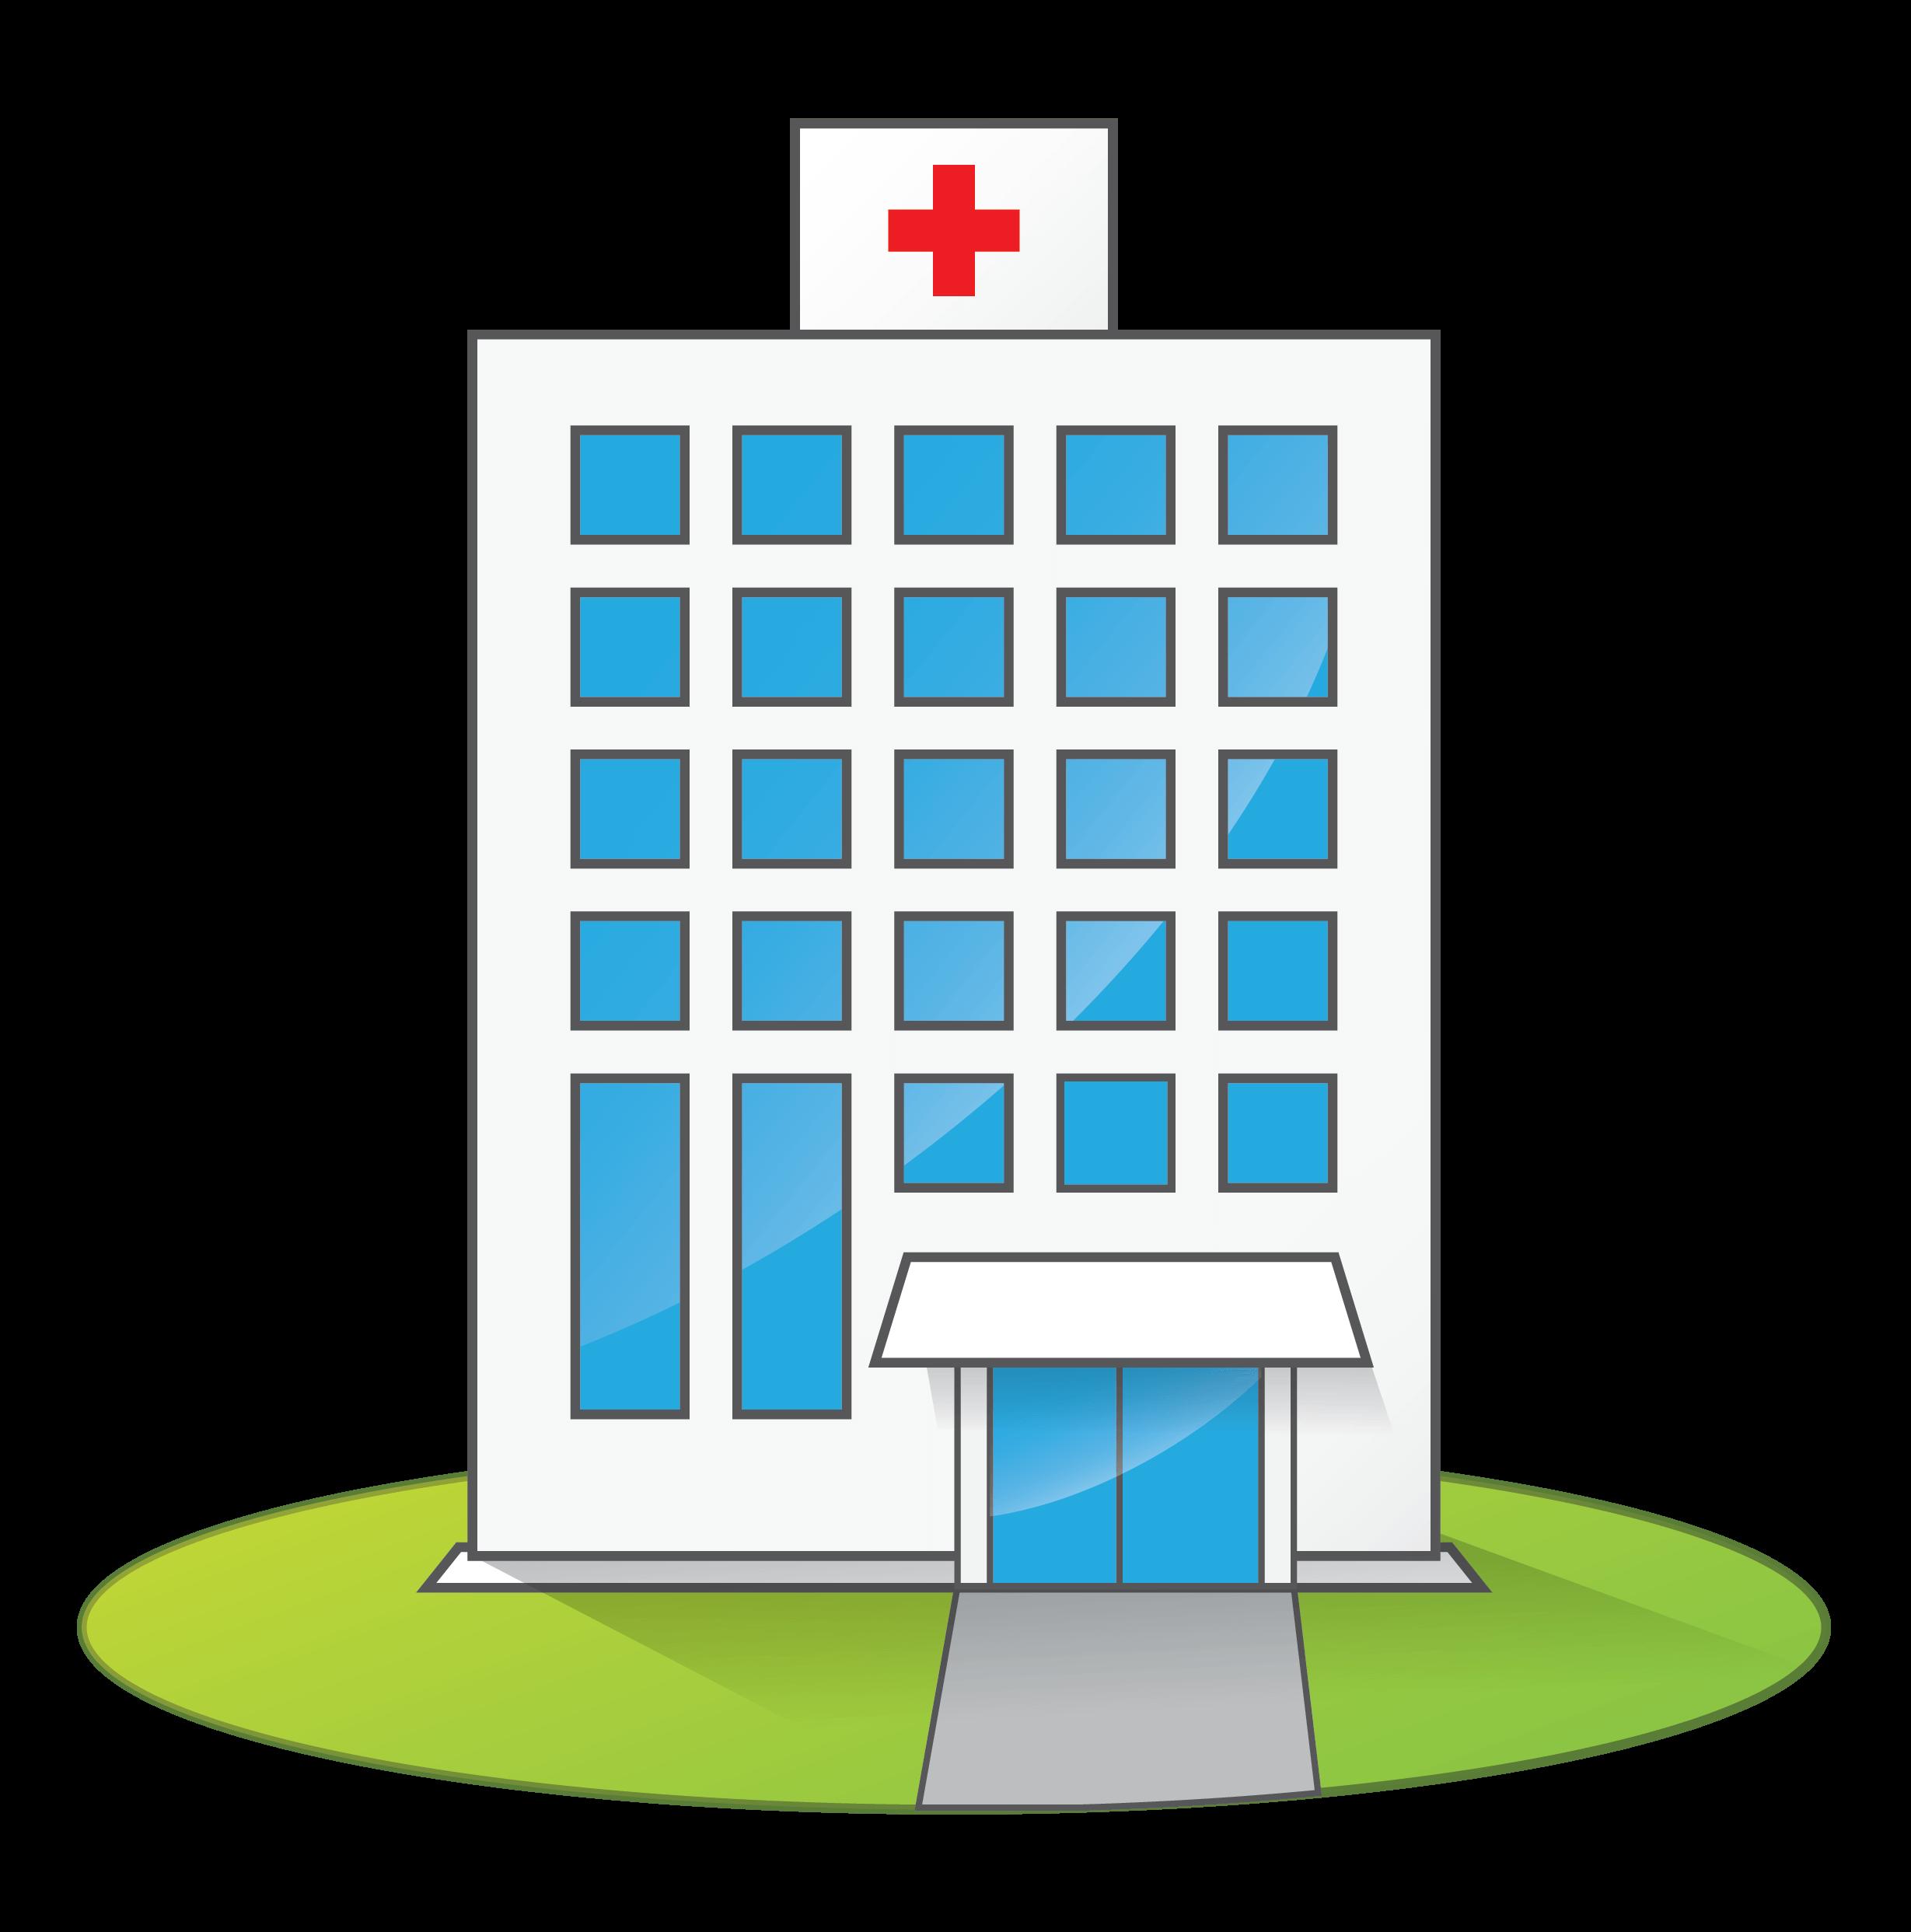 Medical clipart animated. Cute medicine cliparts zone